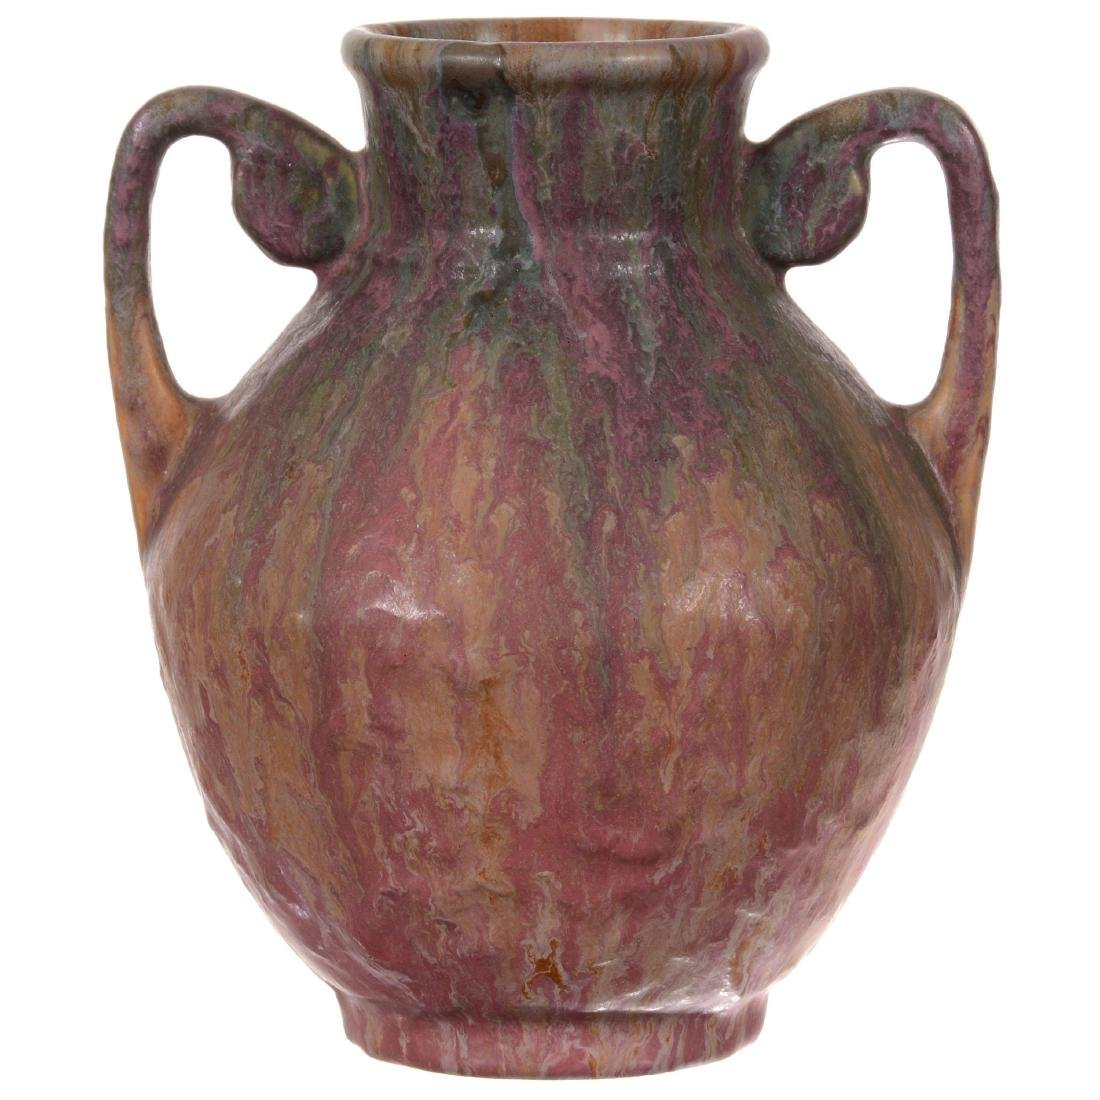 Unmarked Roseville Art Pottery Vase - 2